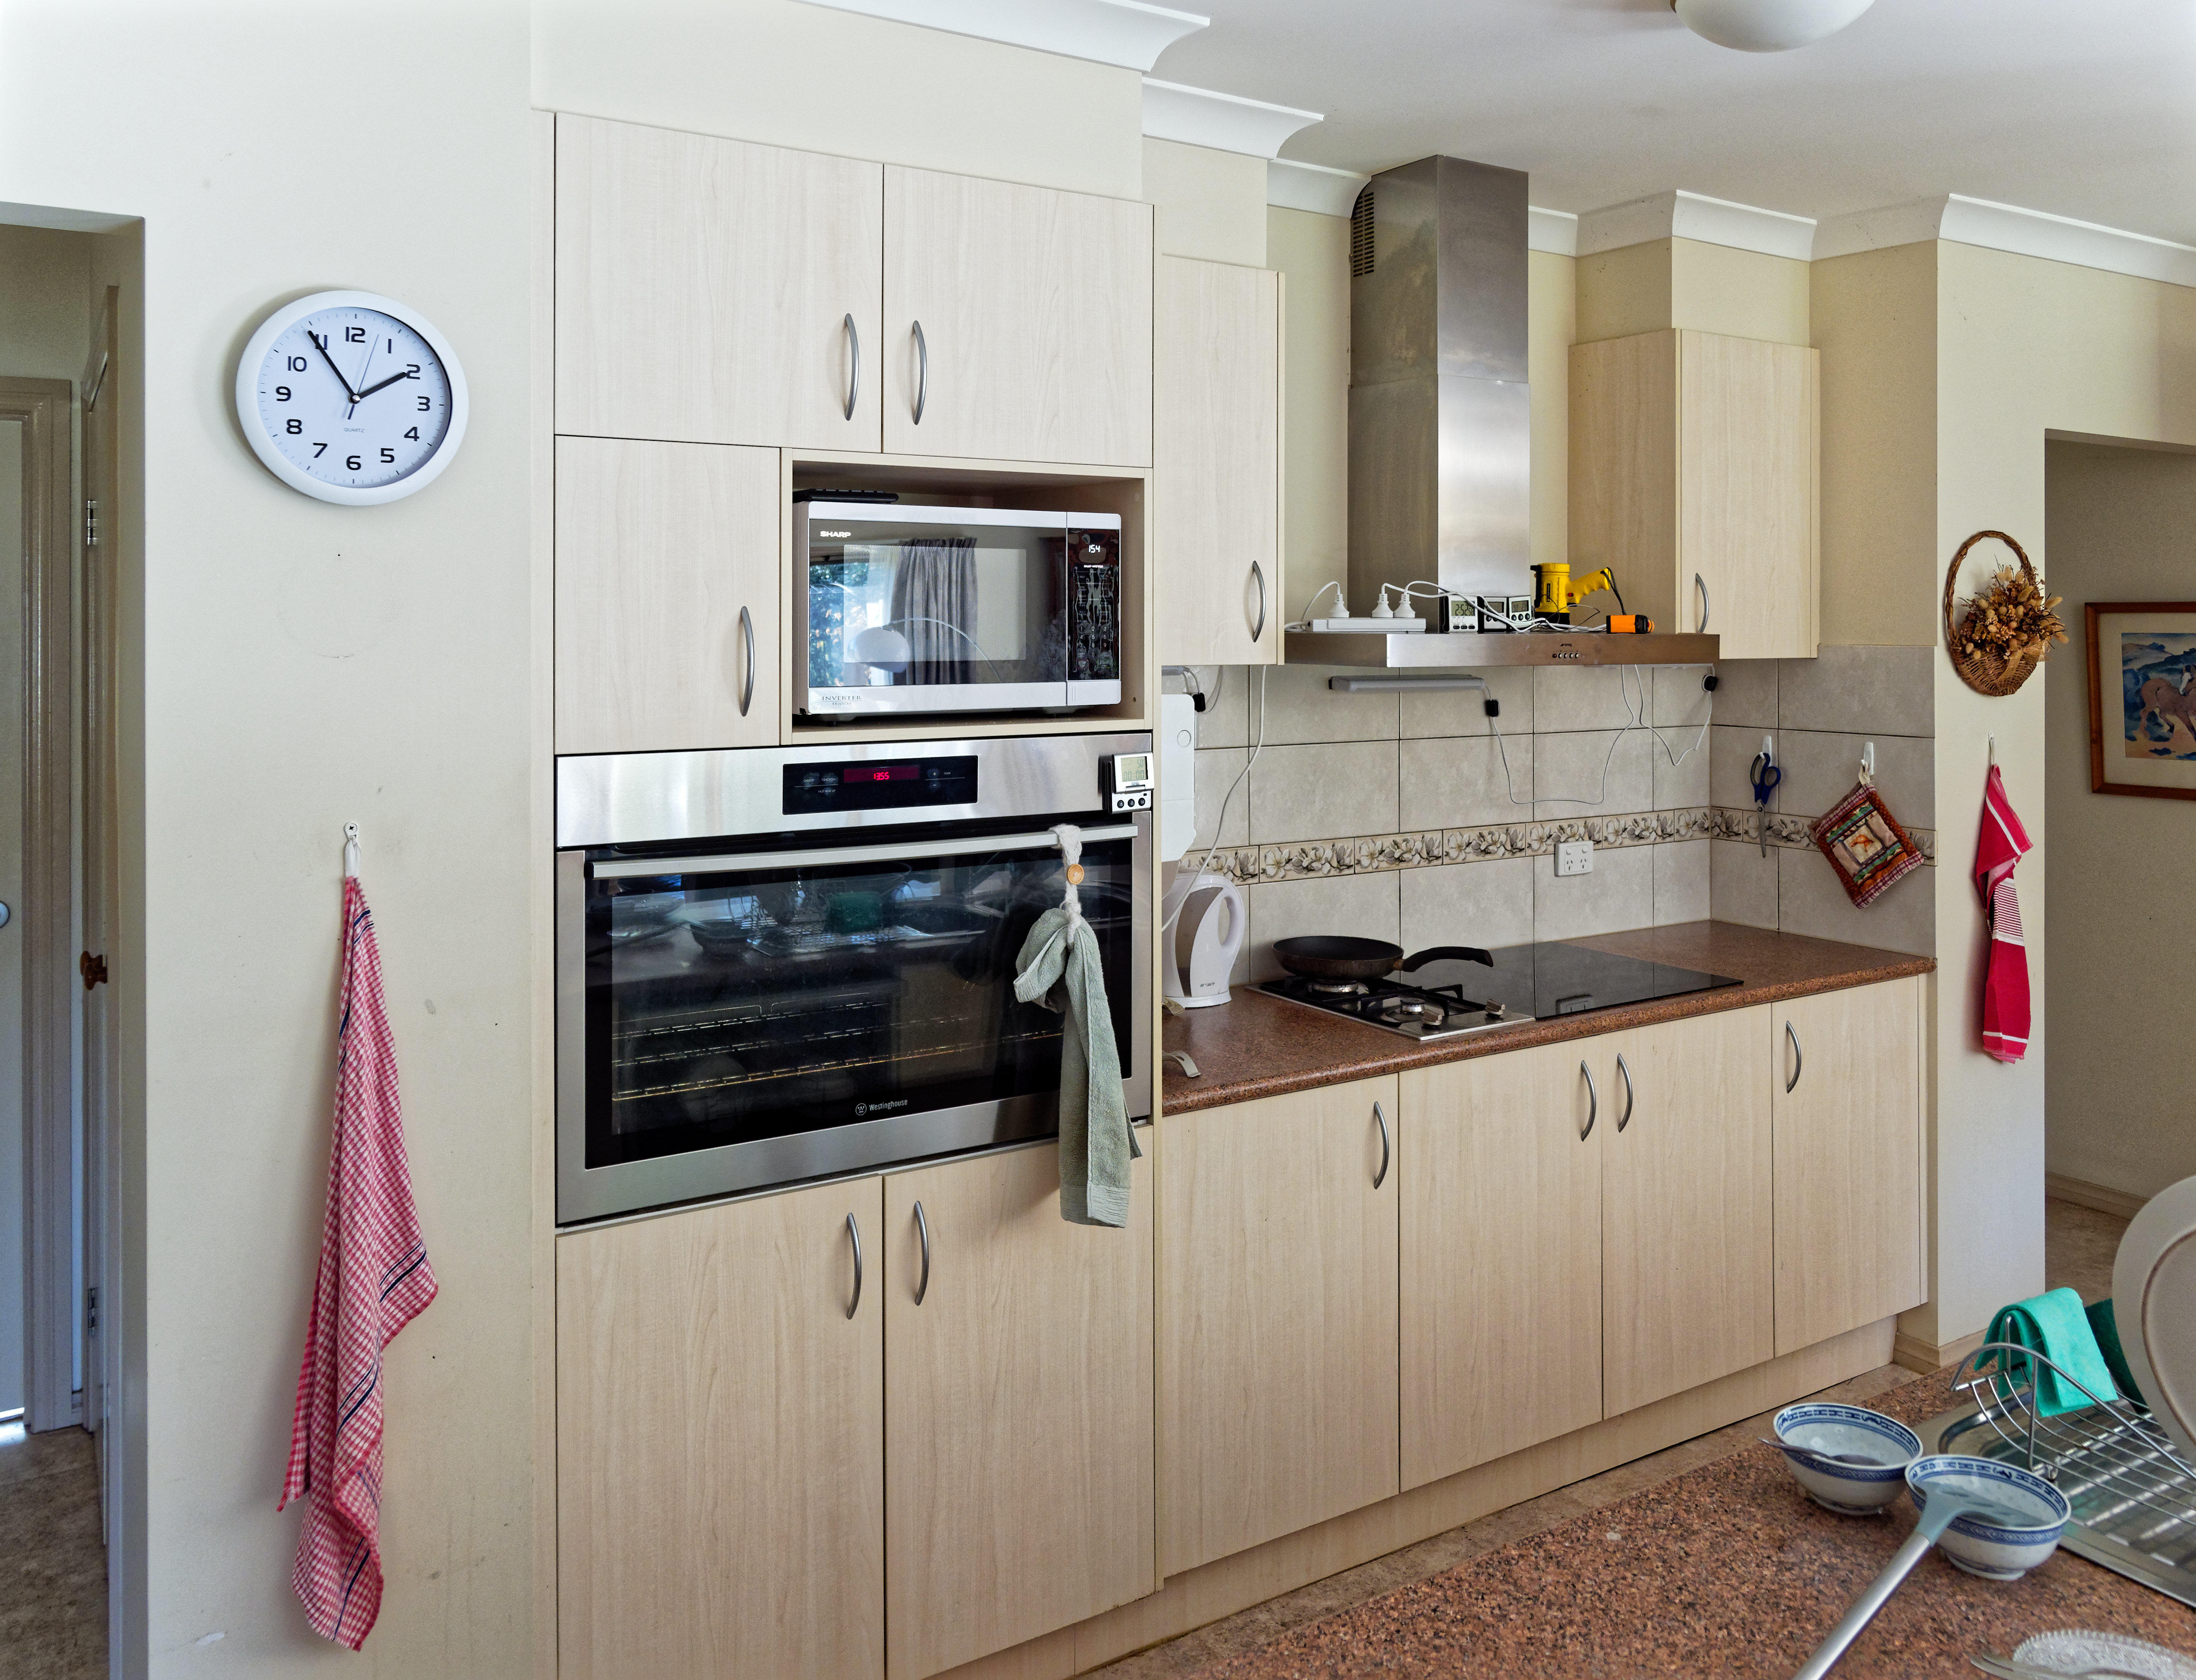 Kitchen-clock.jpeg